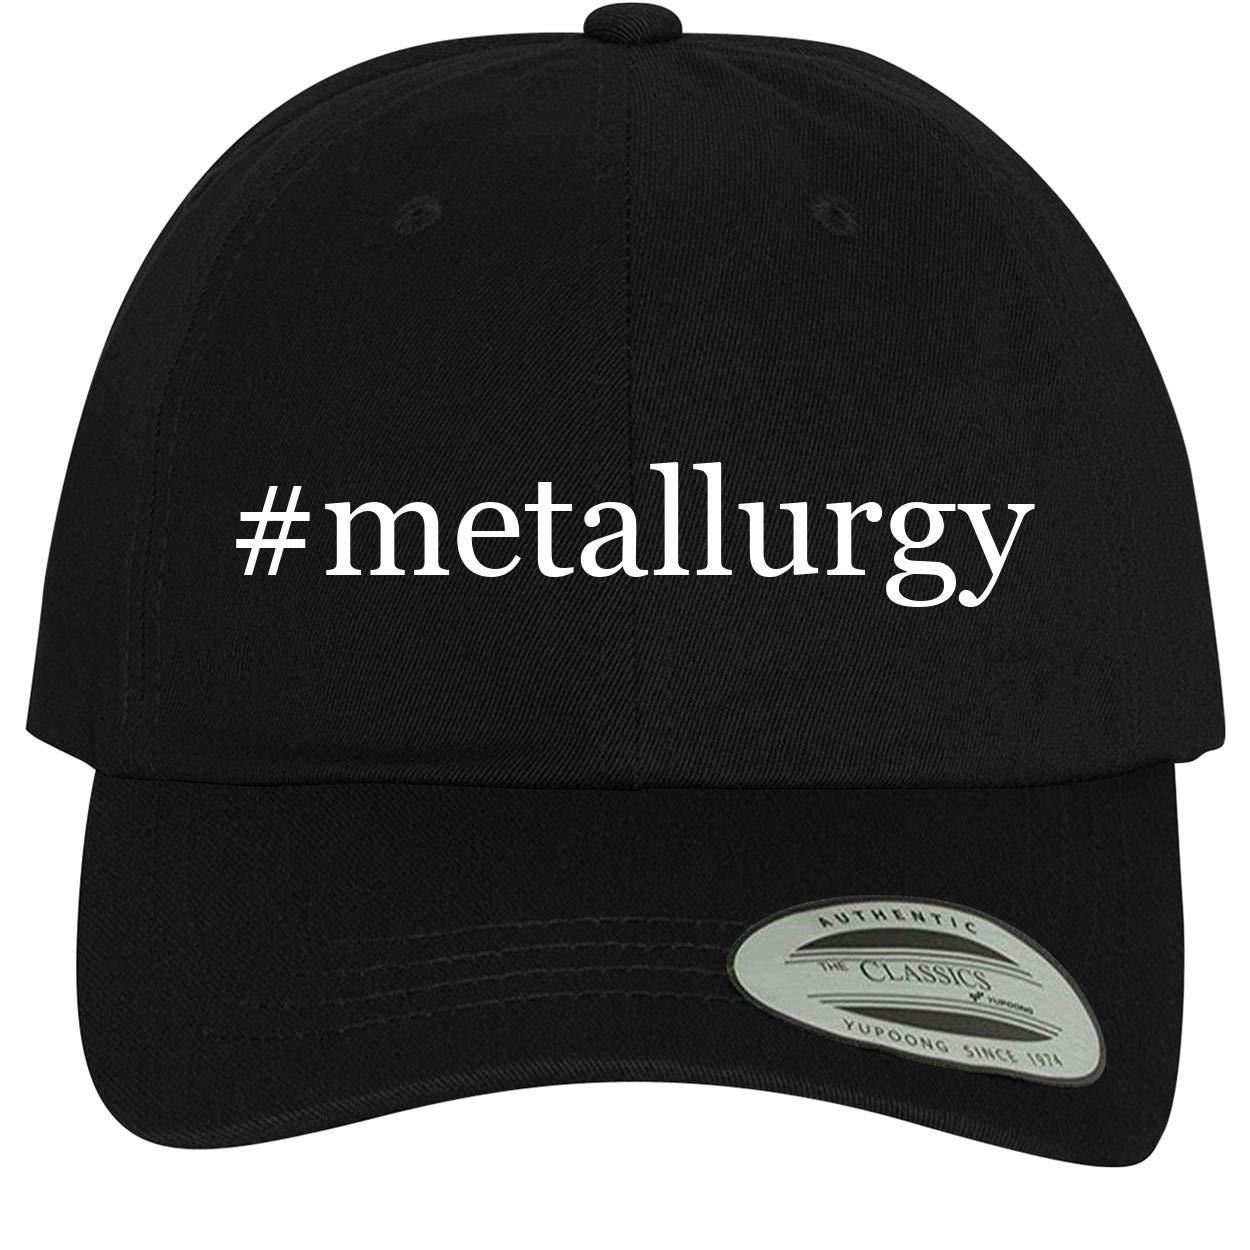 Comfortable Dad Hat Baseball Cap BH Cool Designs #Metallurgy